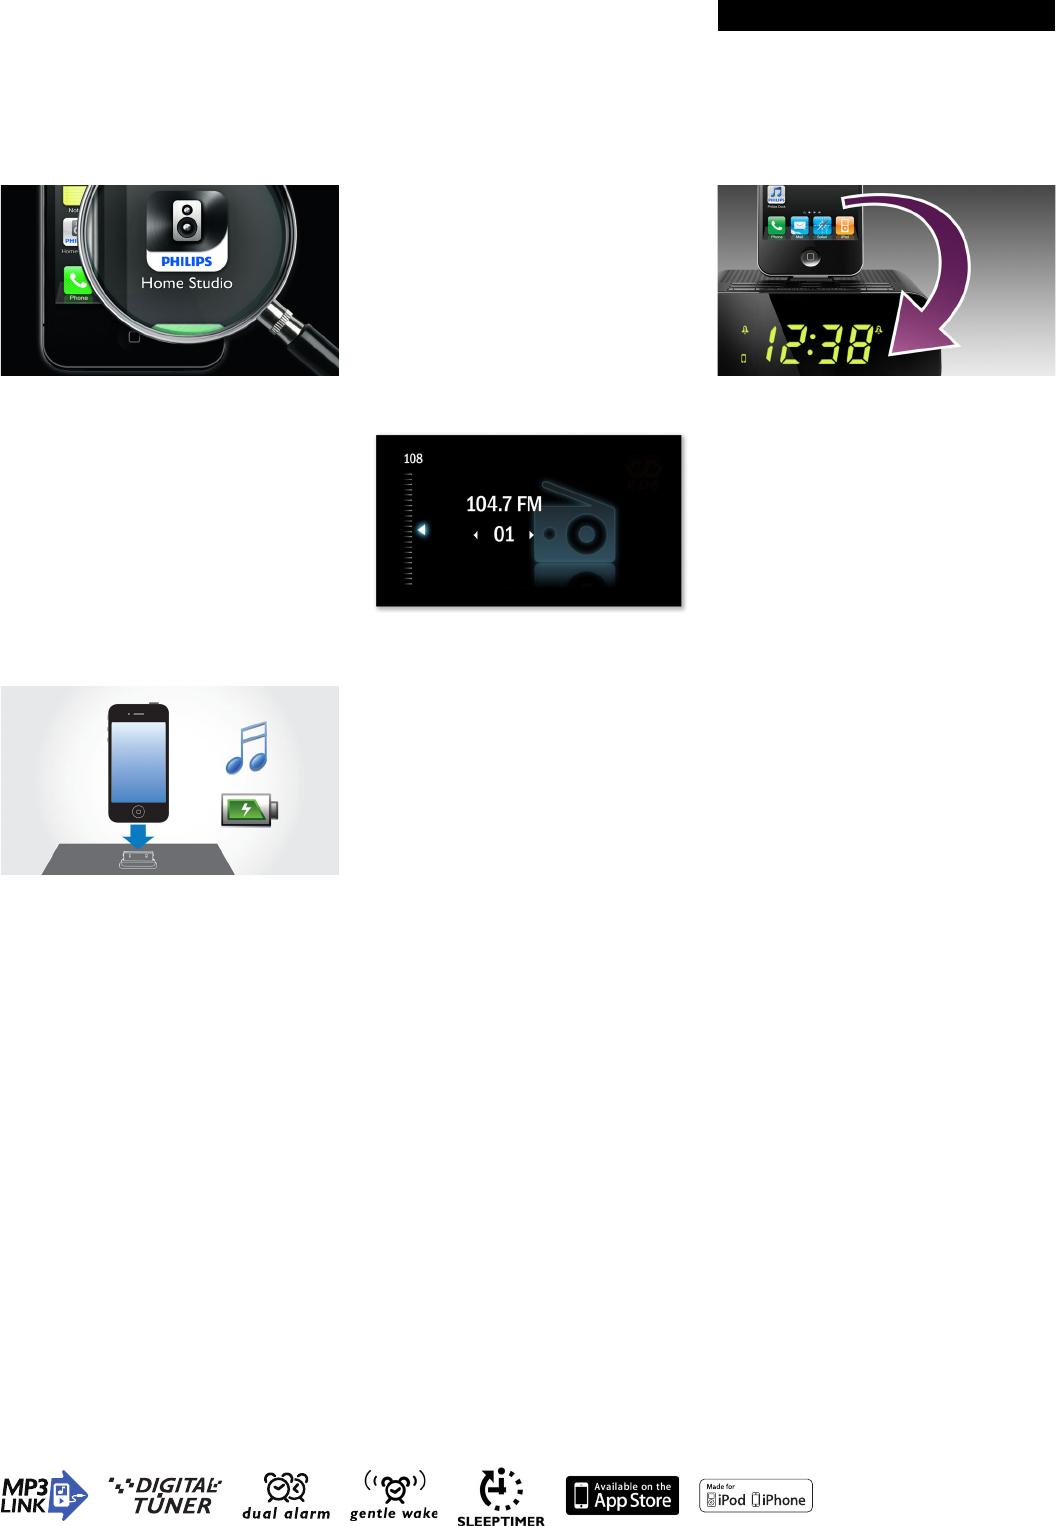 Philips AJ5300D/05 Alarm Clock Radio For IPod/iPhone